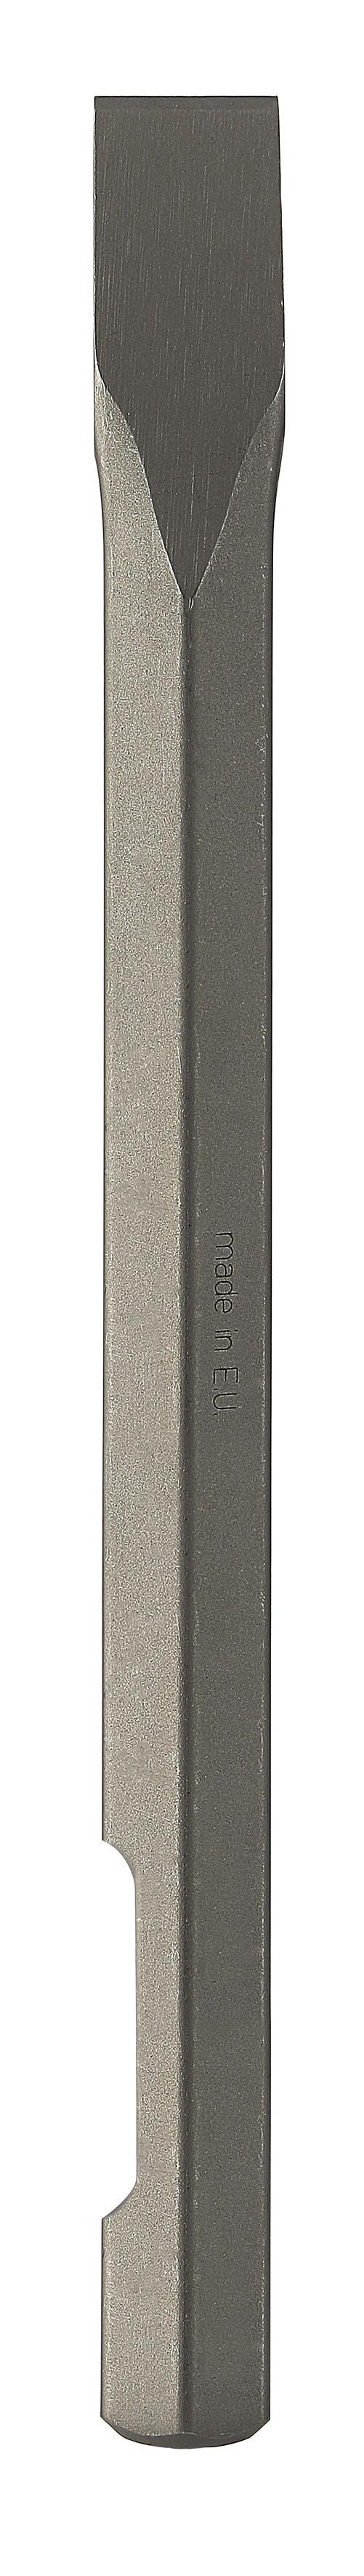 Perçage Burin Burin hexagonal 28 mm + méplat - 341.jpg